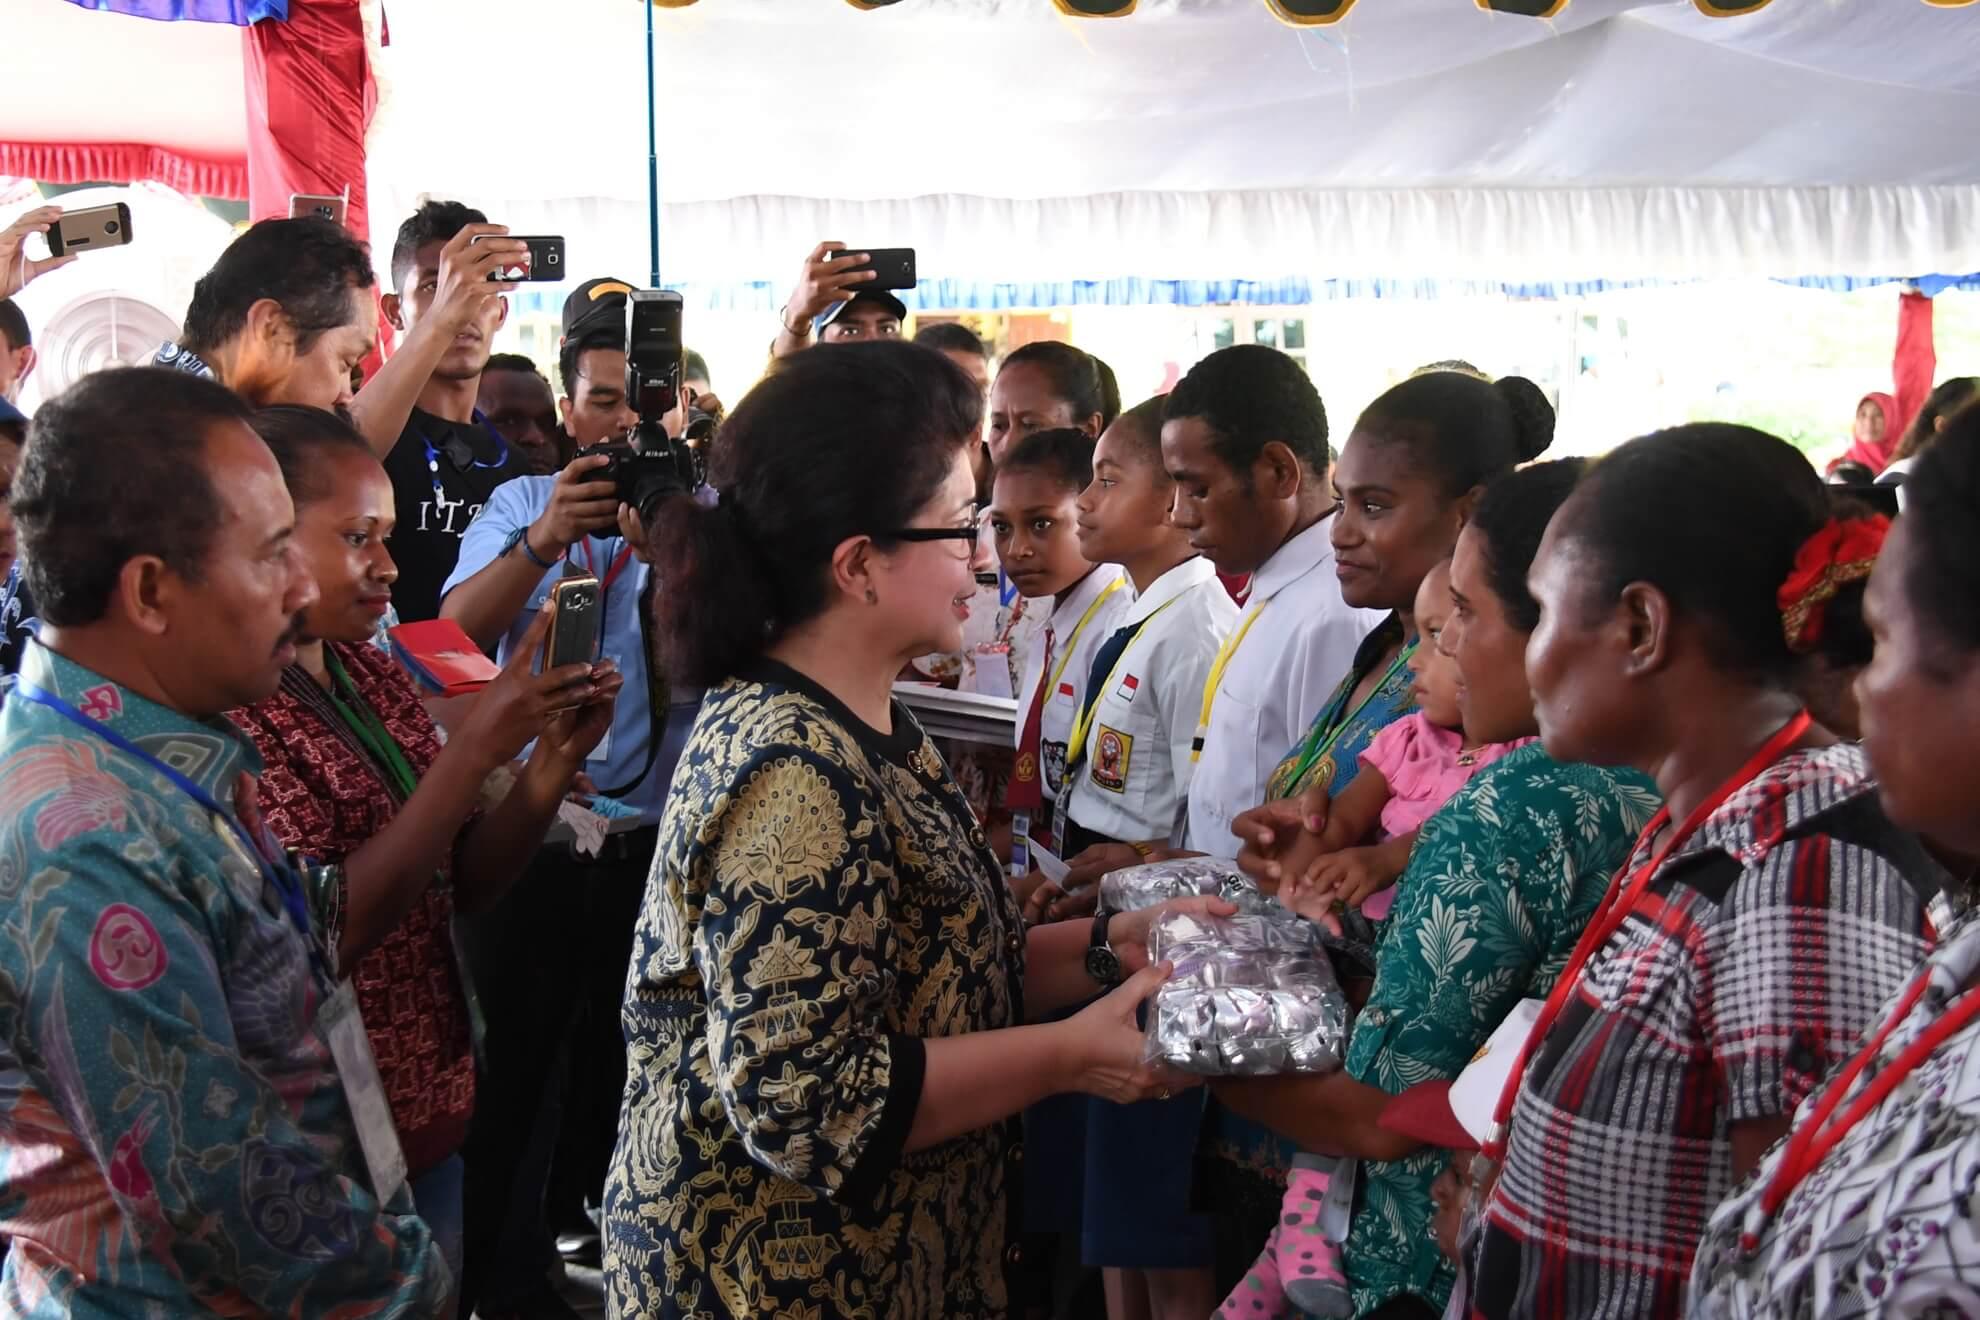 9-5-2017-menkes-memberikan-bantuan-mpasi-pada-pembagian-kis-kip-pkh-pmt-oleh-presiden-di-kota-jayapura-jpg